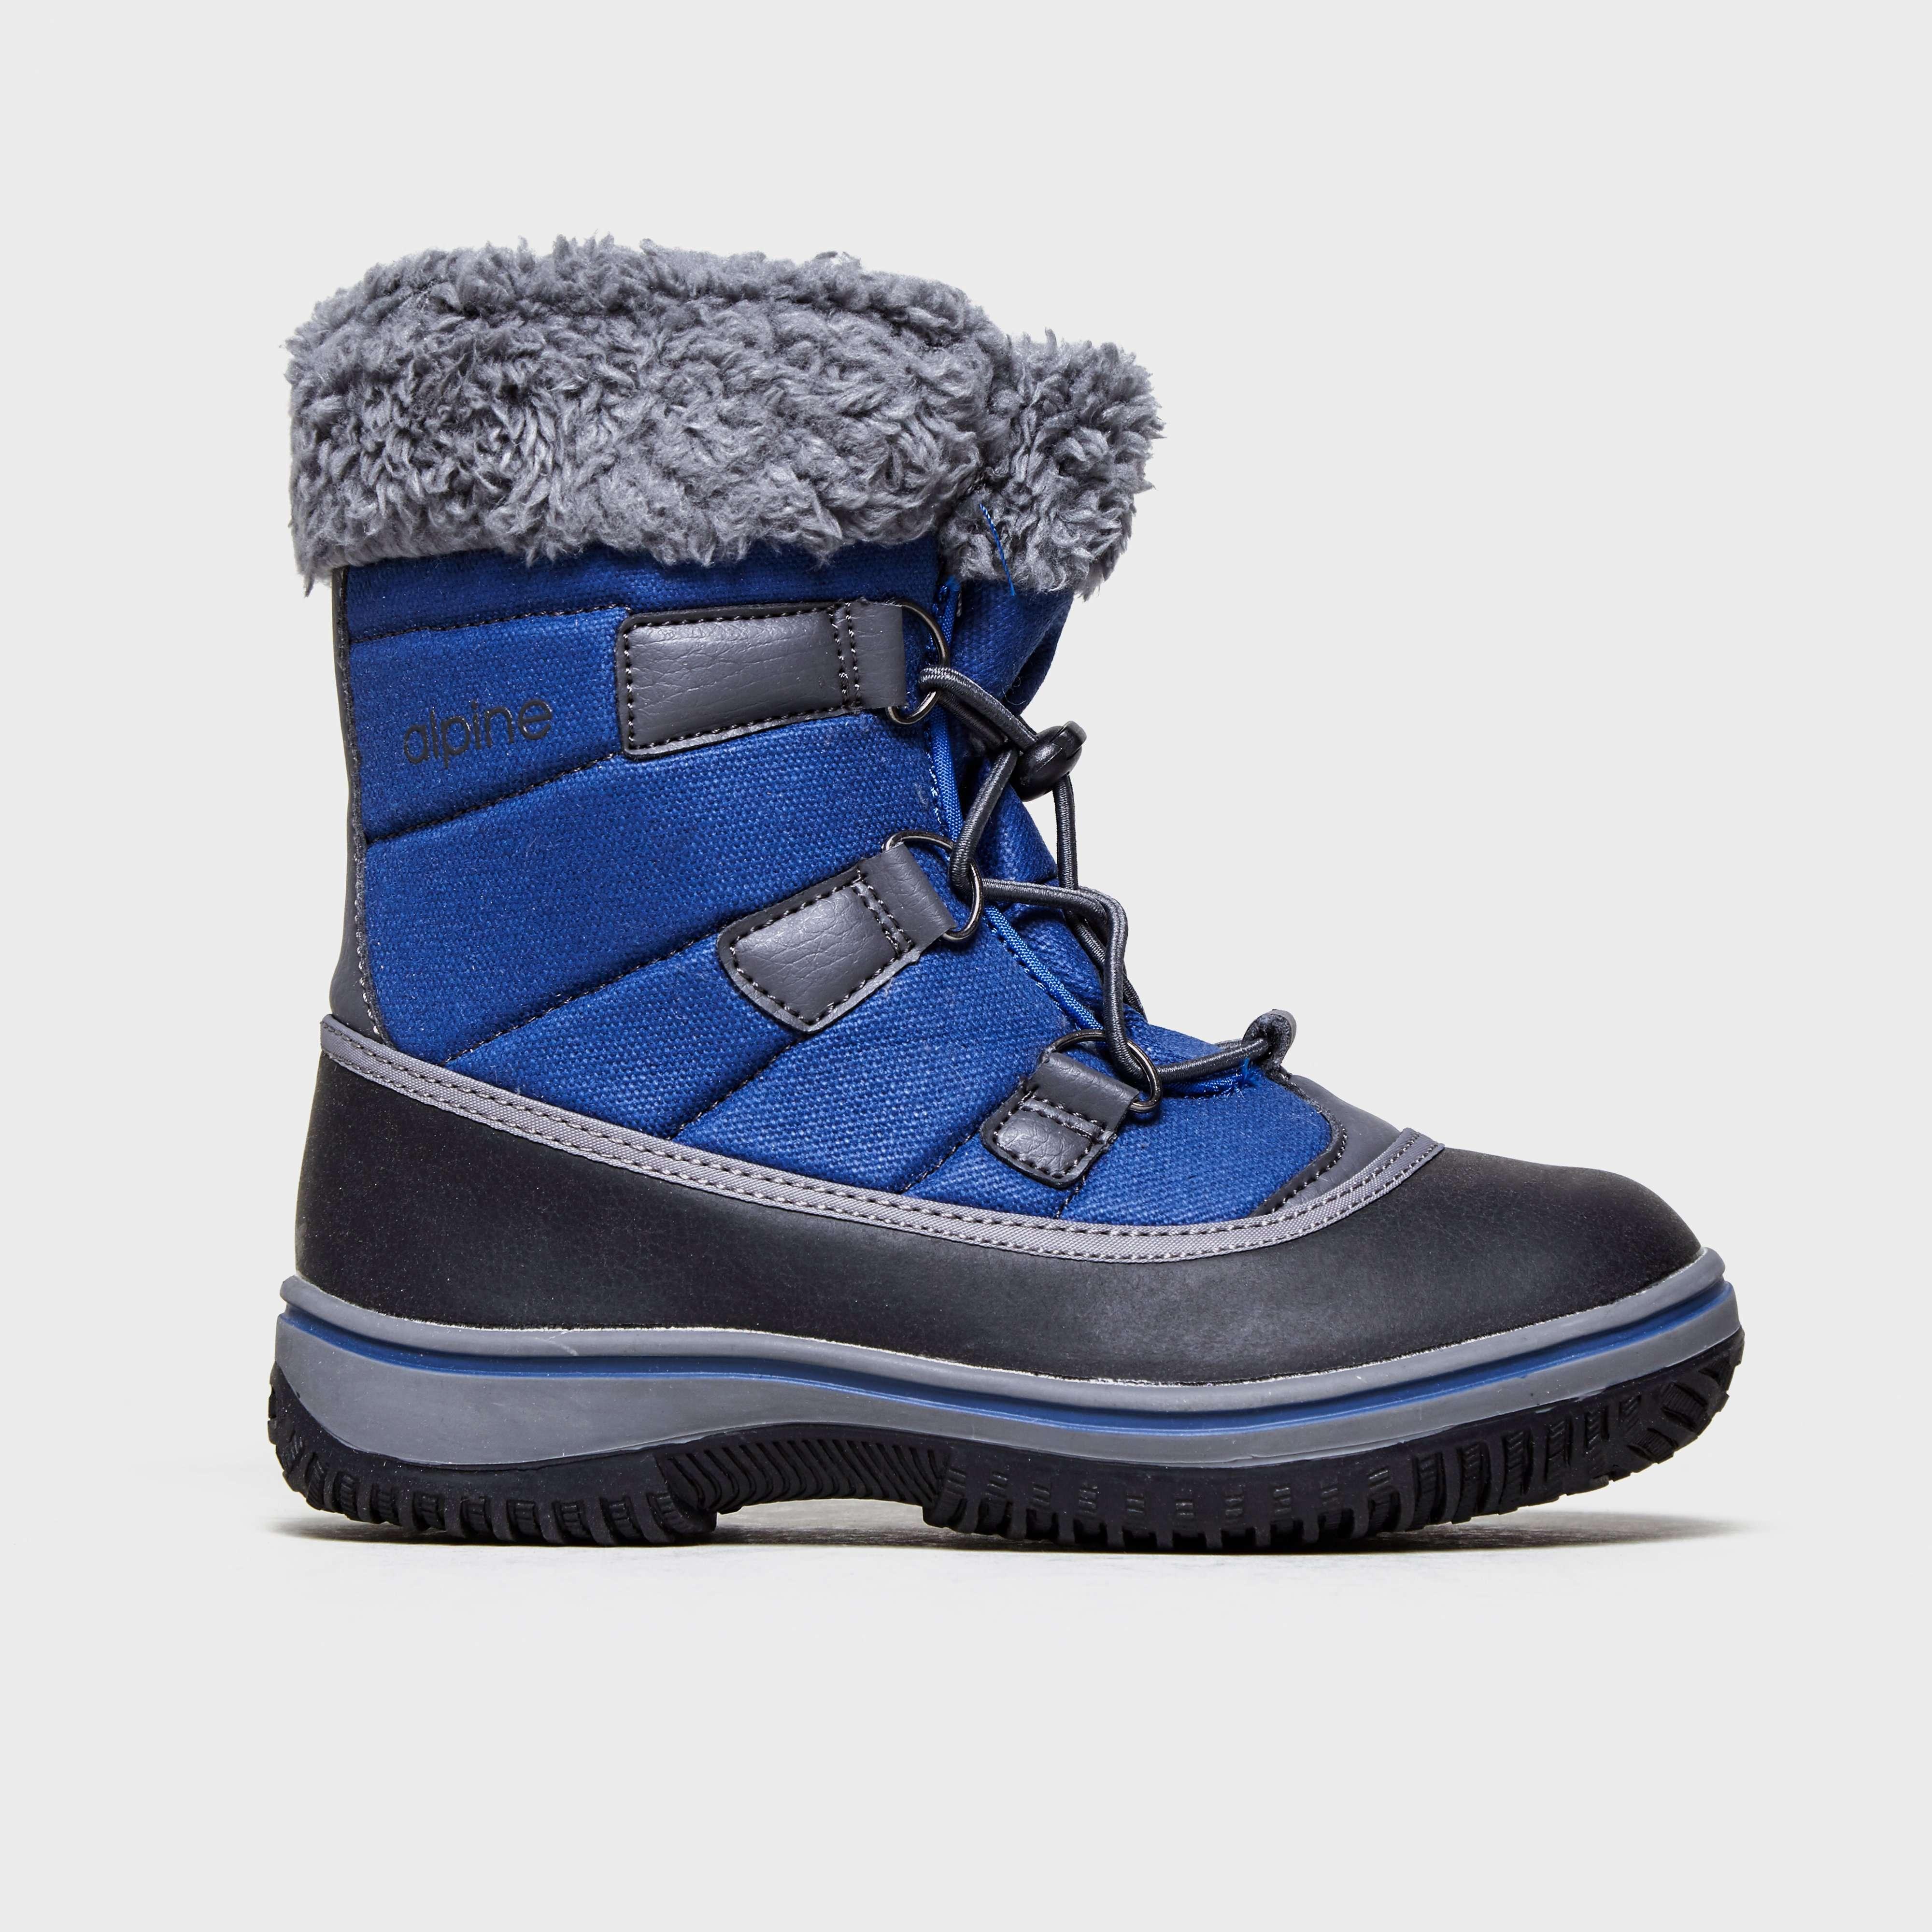 ALPINE Boys' Snow Boot